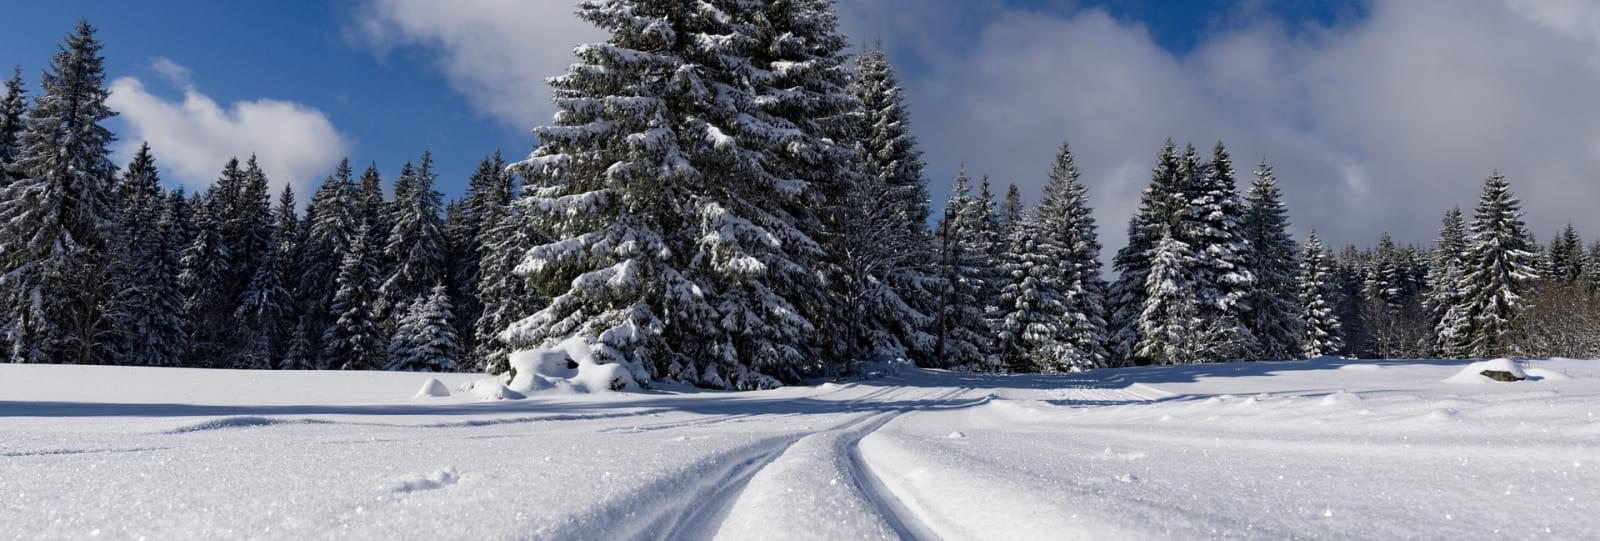 Location de skis - Col de Carri